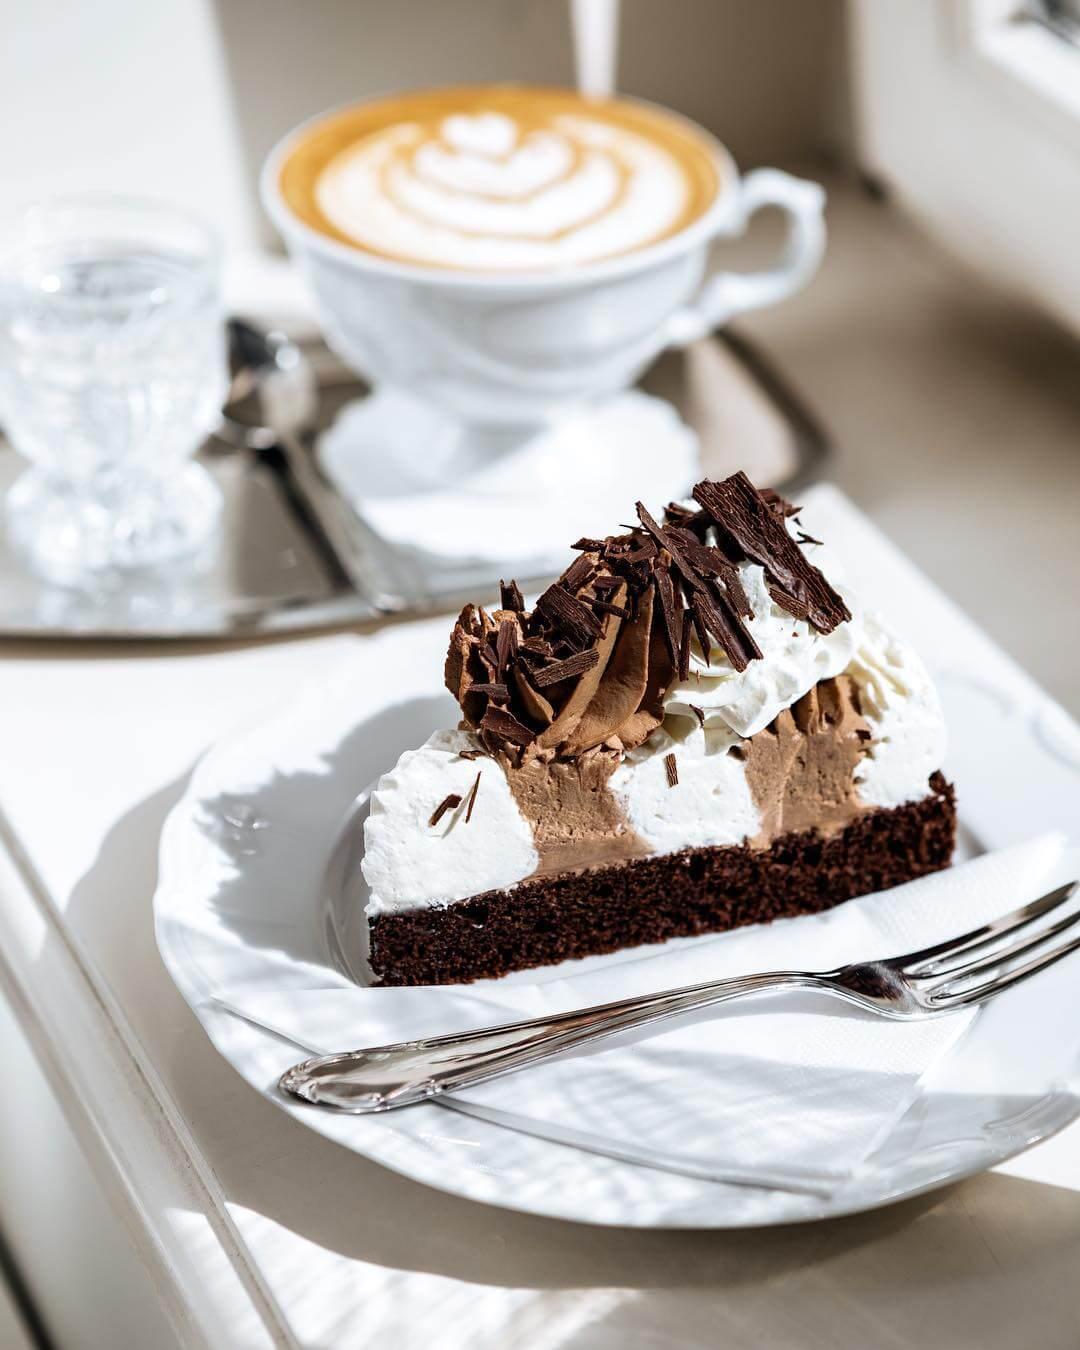 Kam na kafe a dort v Praze?